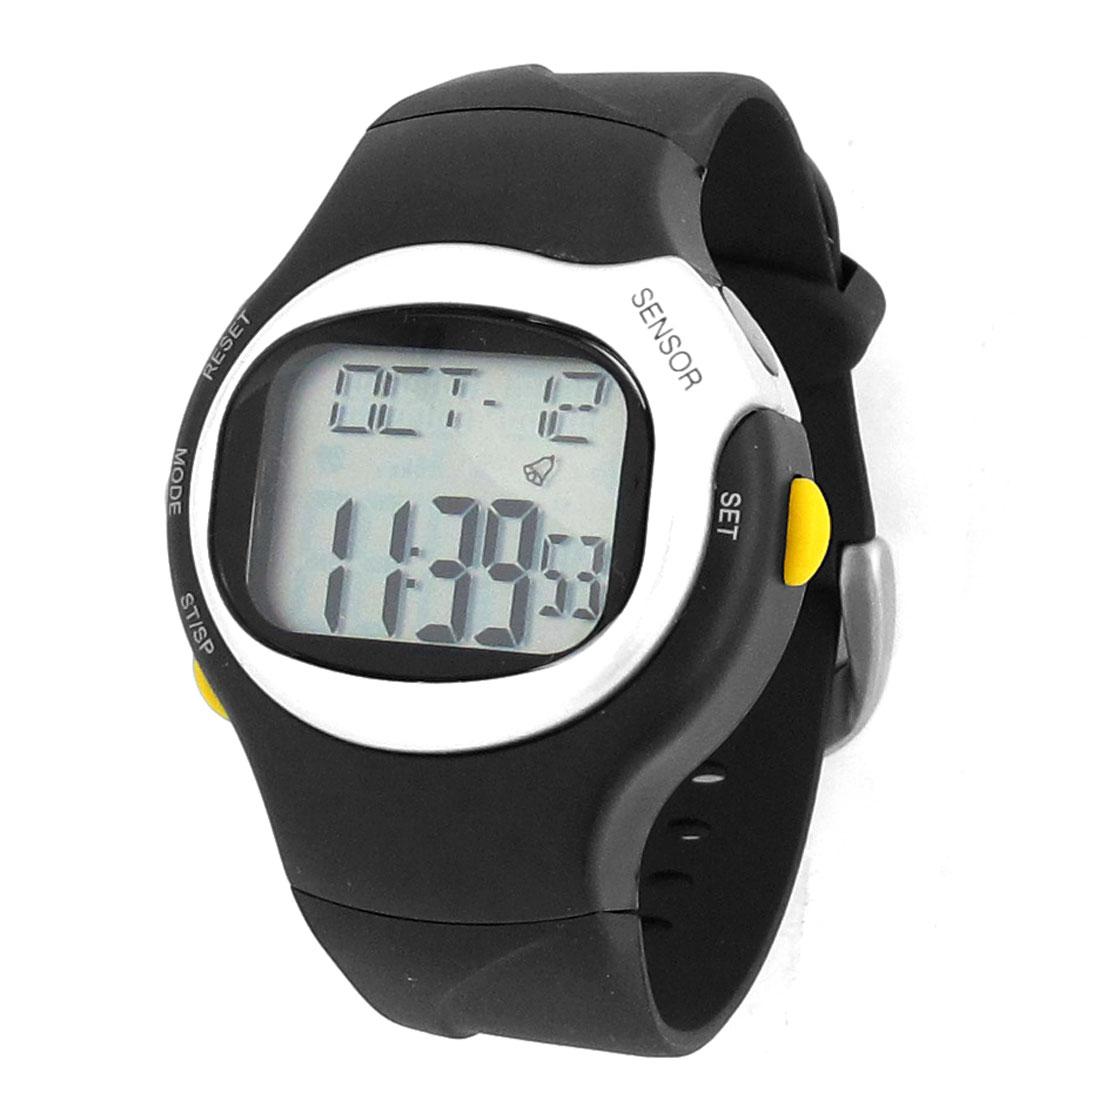 Adjustable Band Round Case Pulsometer Stopwatch Alarm Clock Sports Watch Black